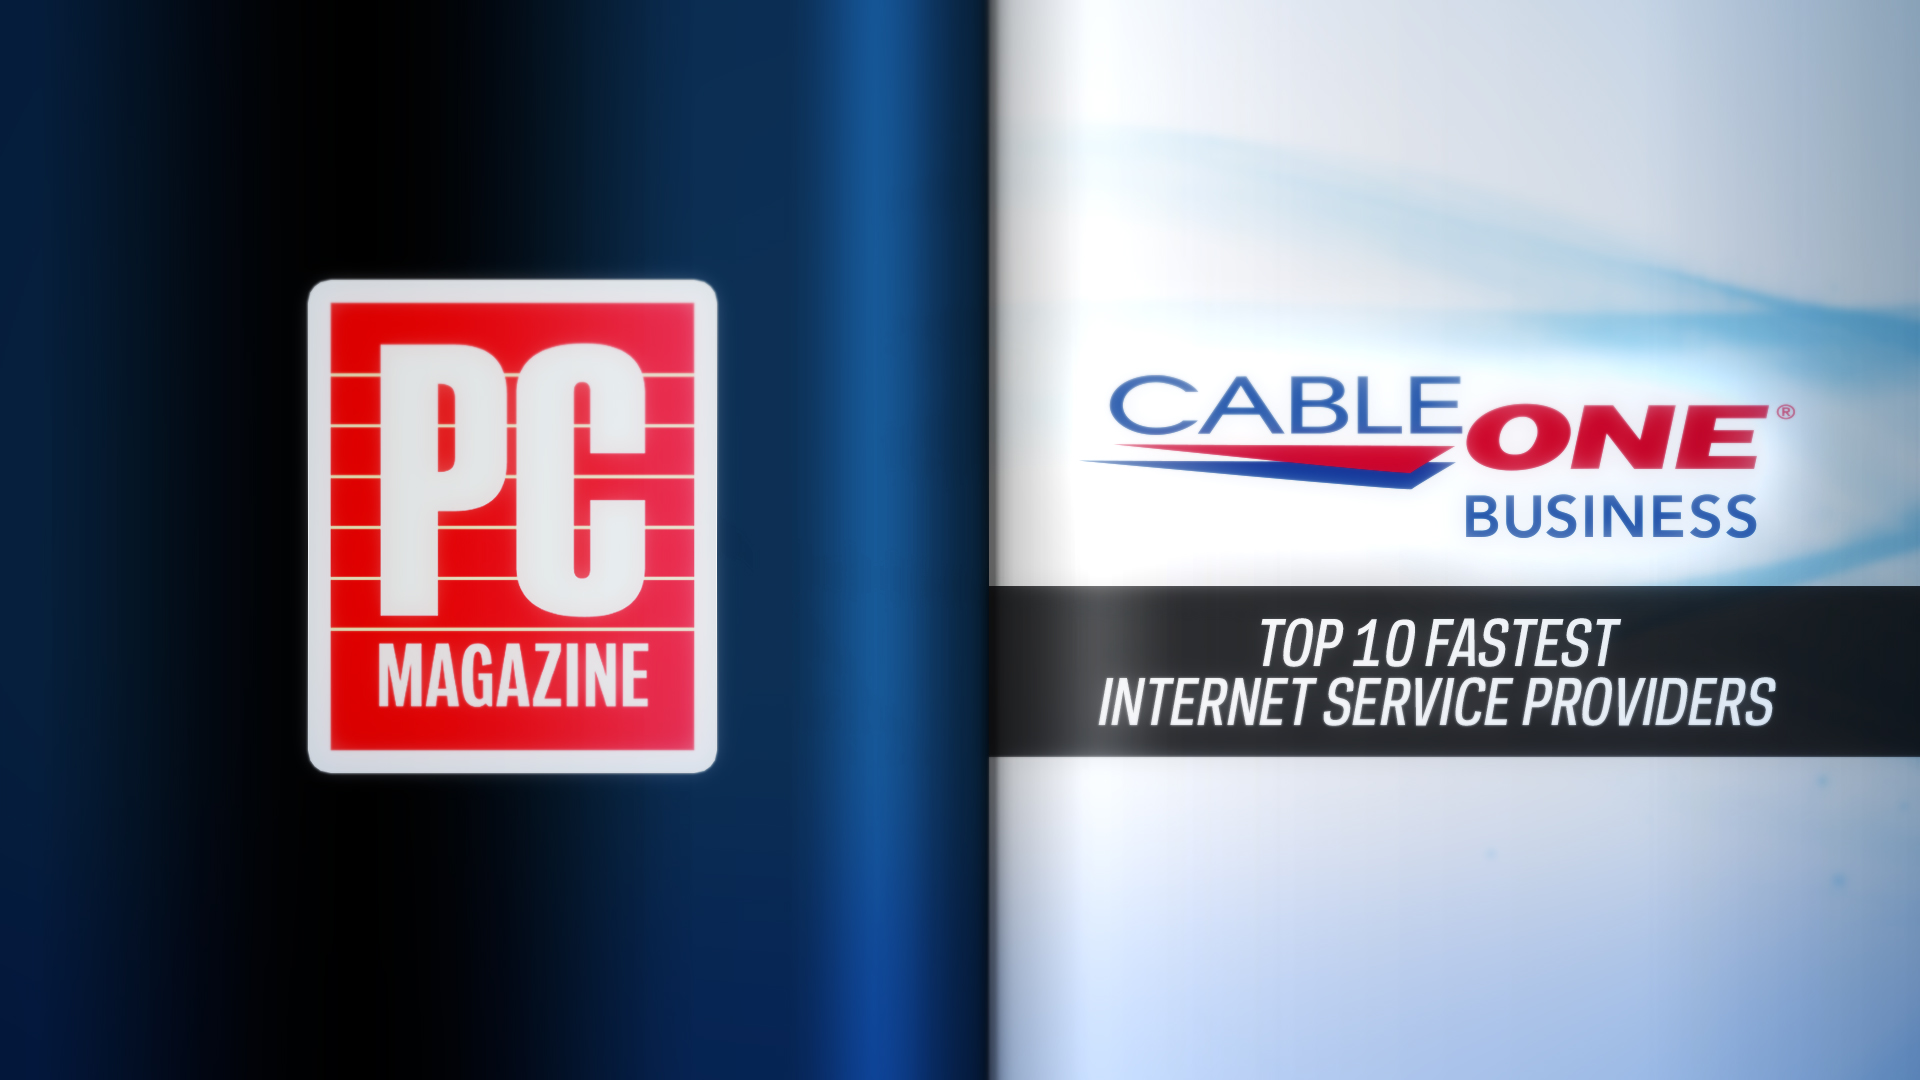 PC Magazine A01.jpg